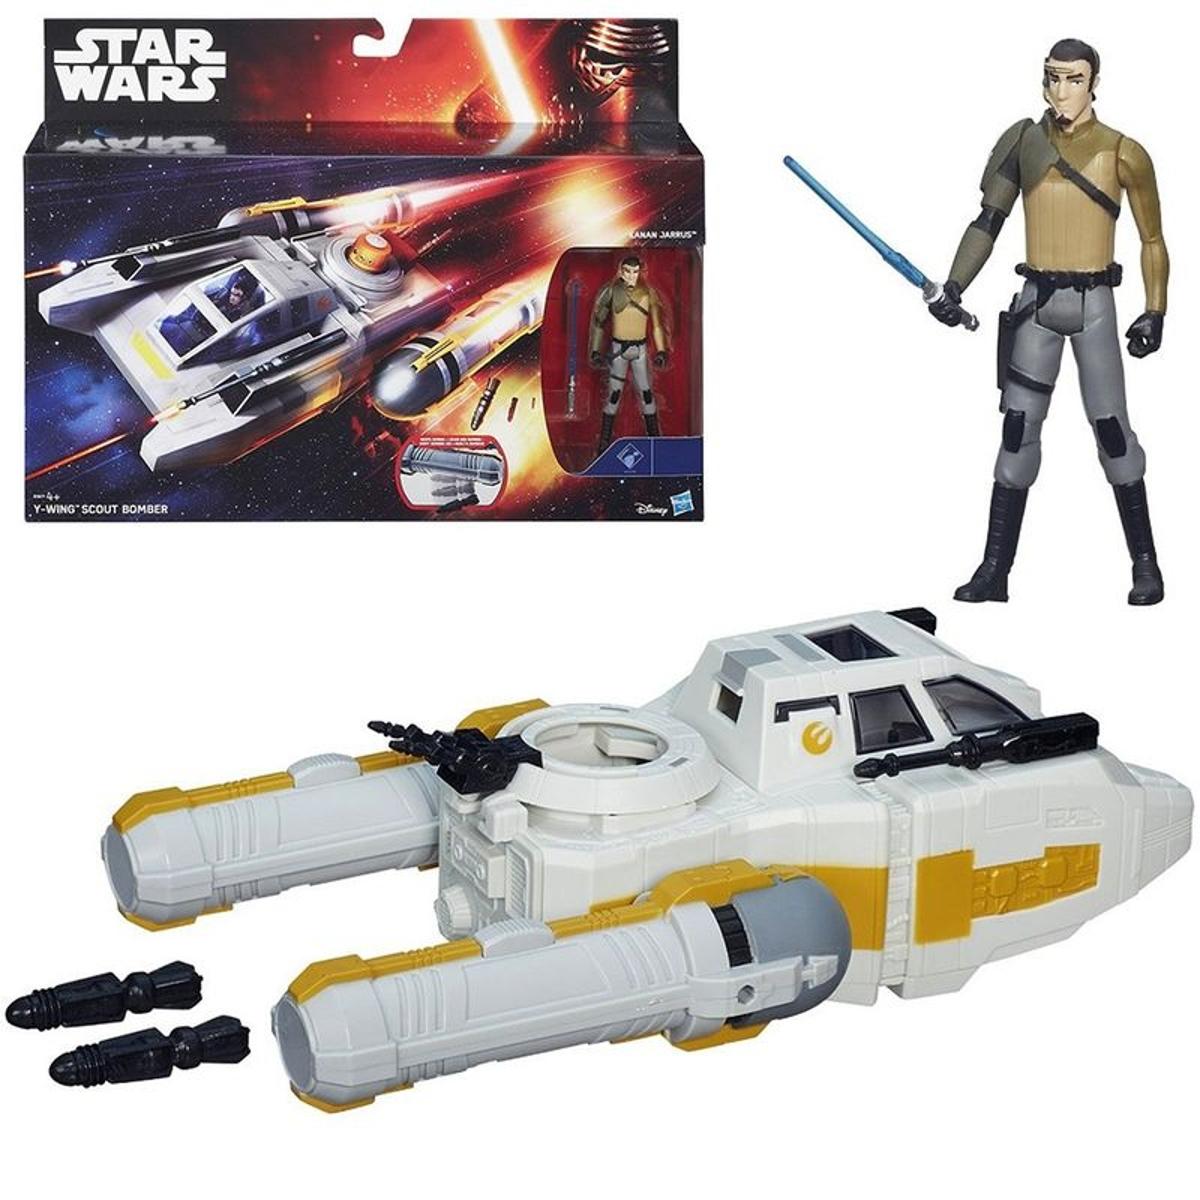 Véhicule miniature Star Wars avec personnage